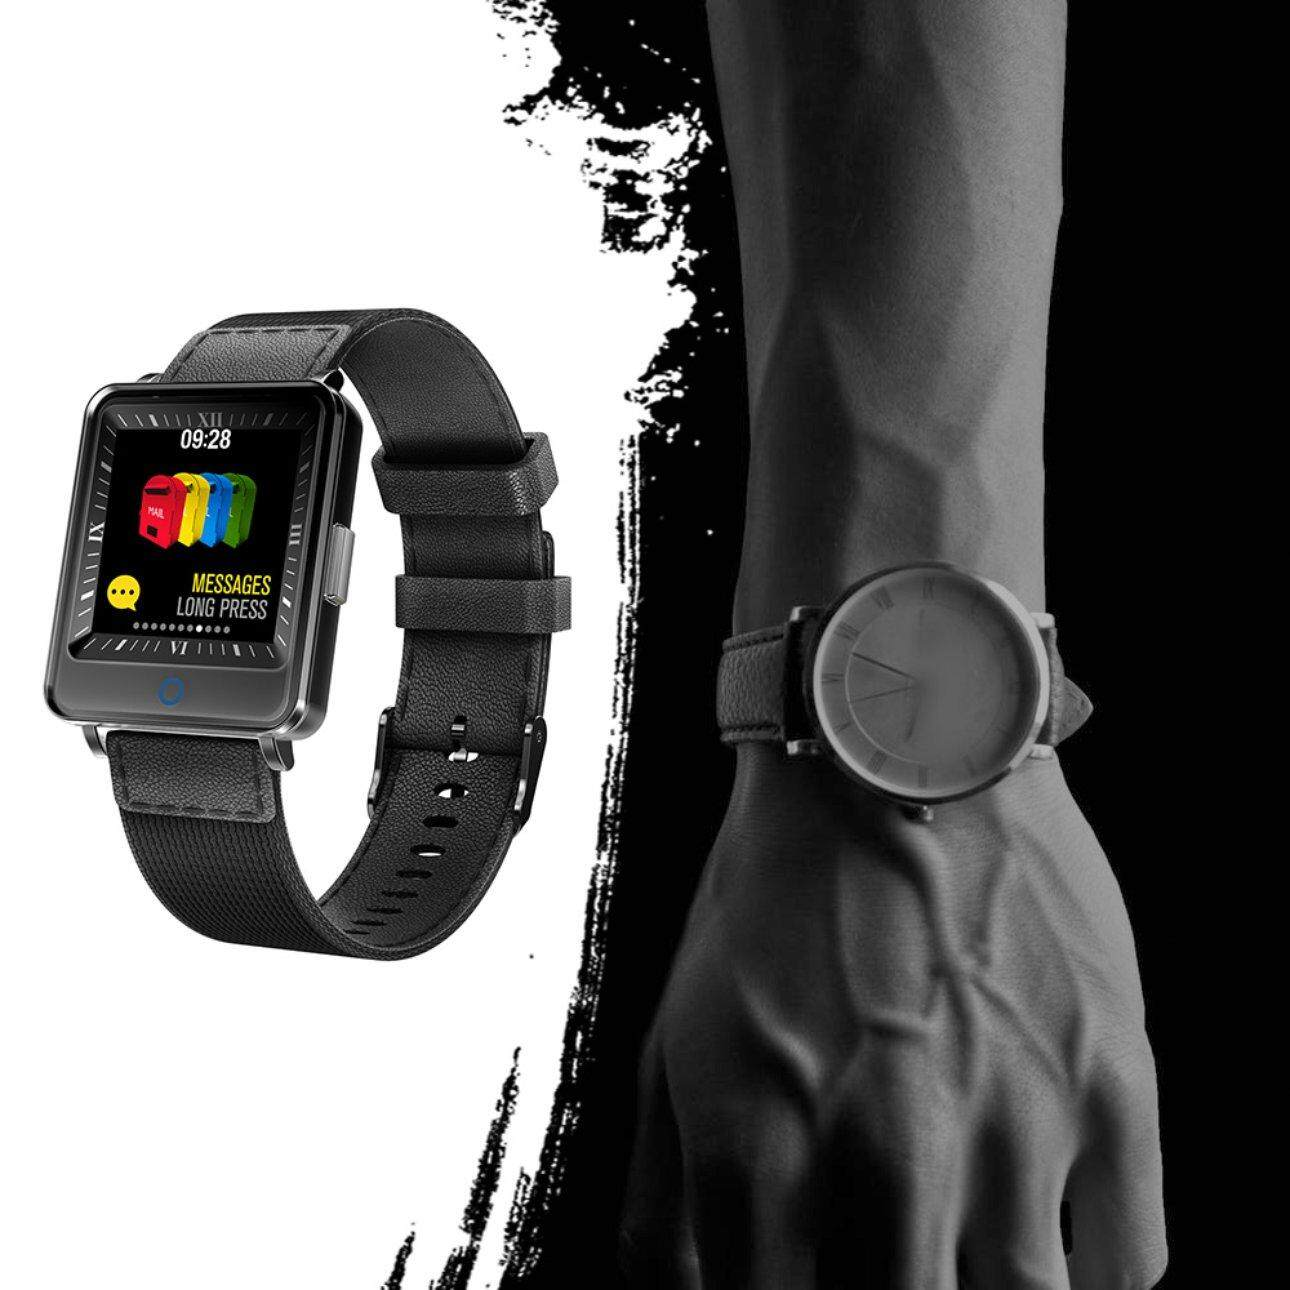 Hot Sales Business Style Designed For Business People V16 Dual-screen Smart Bracelet